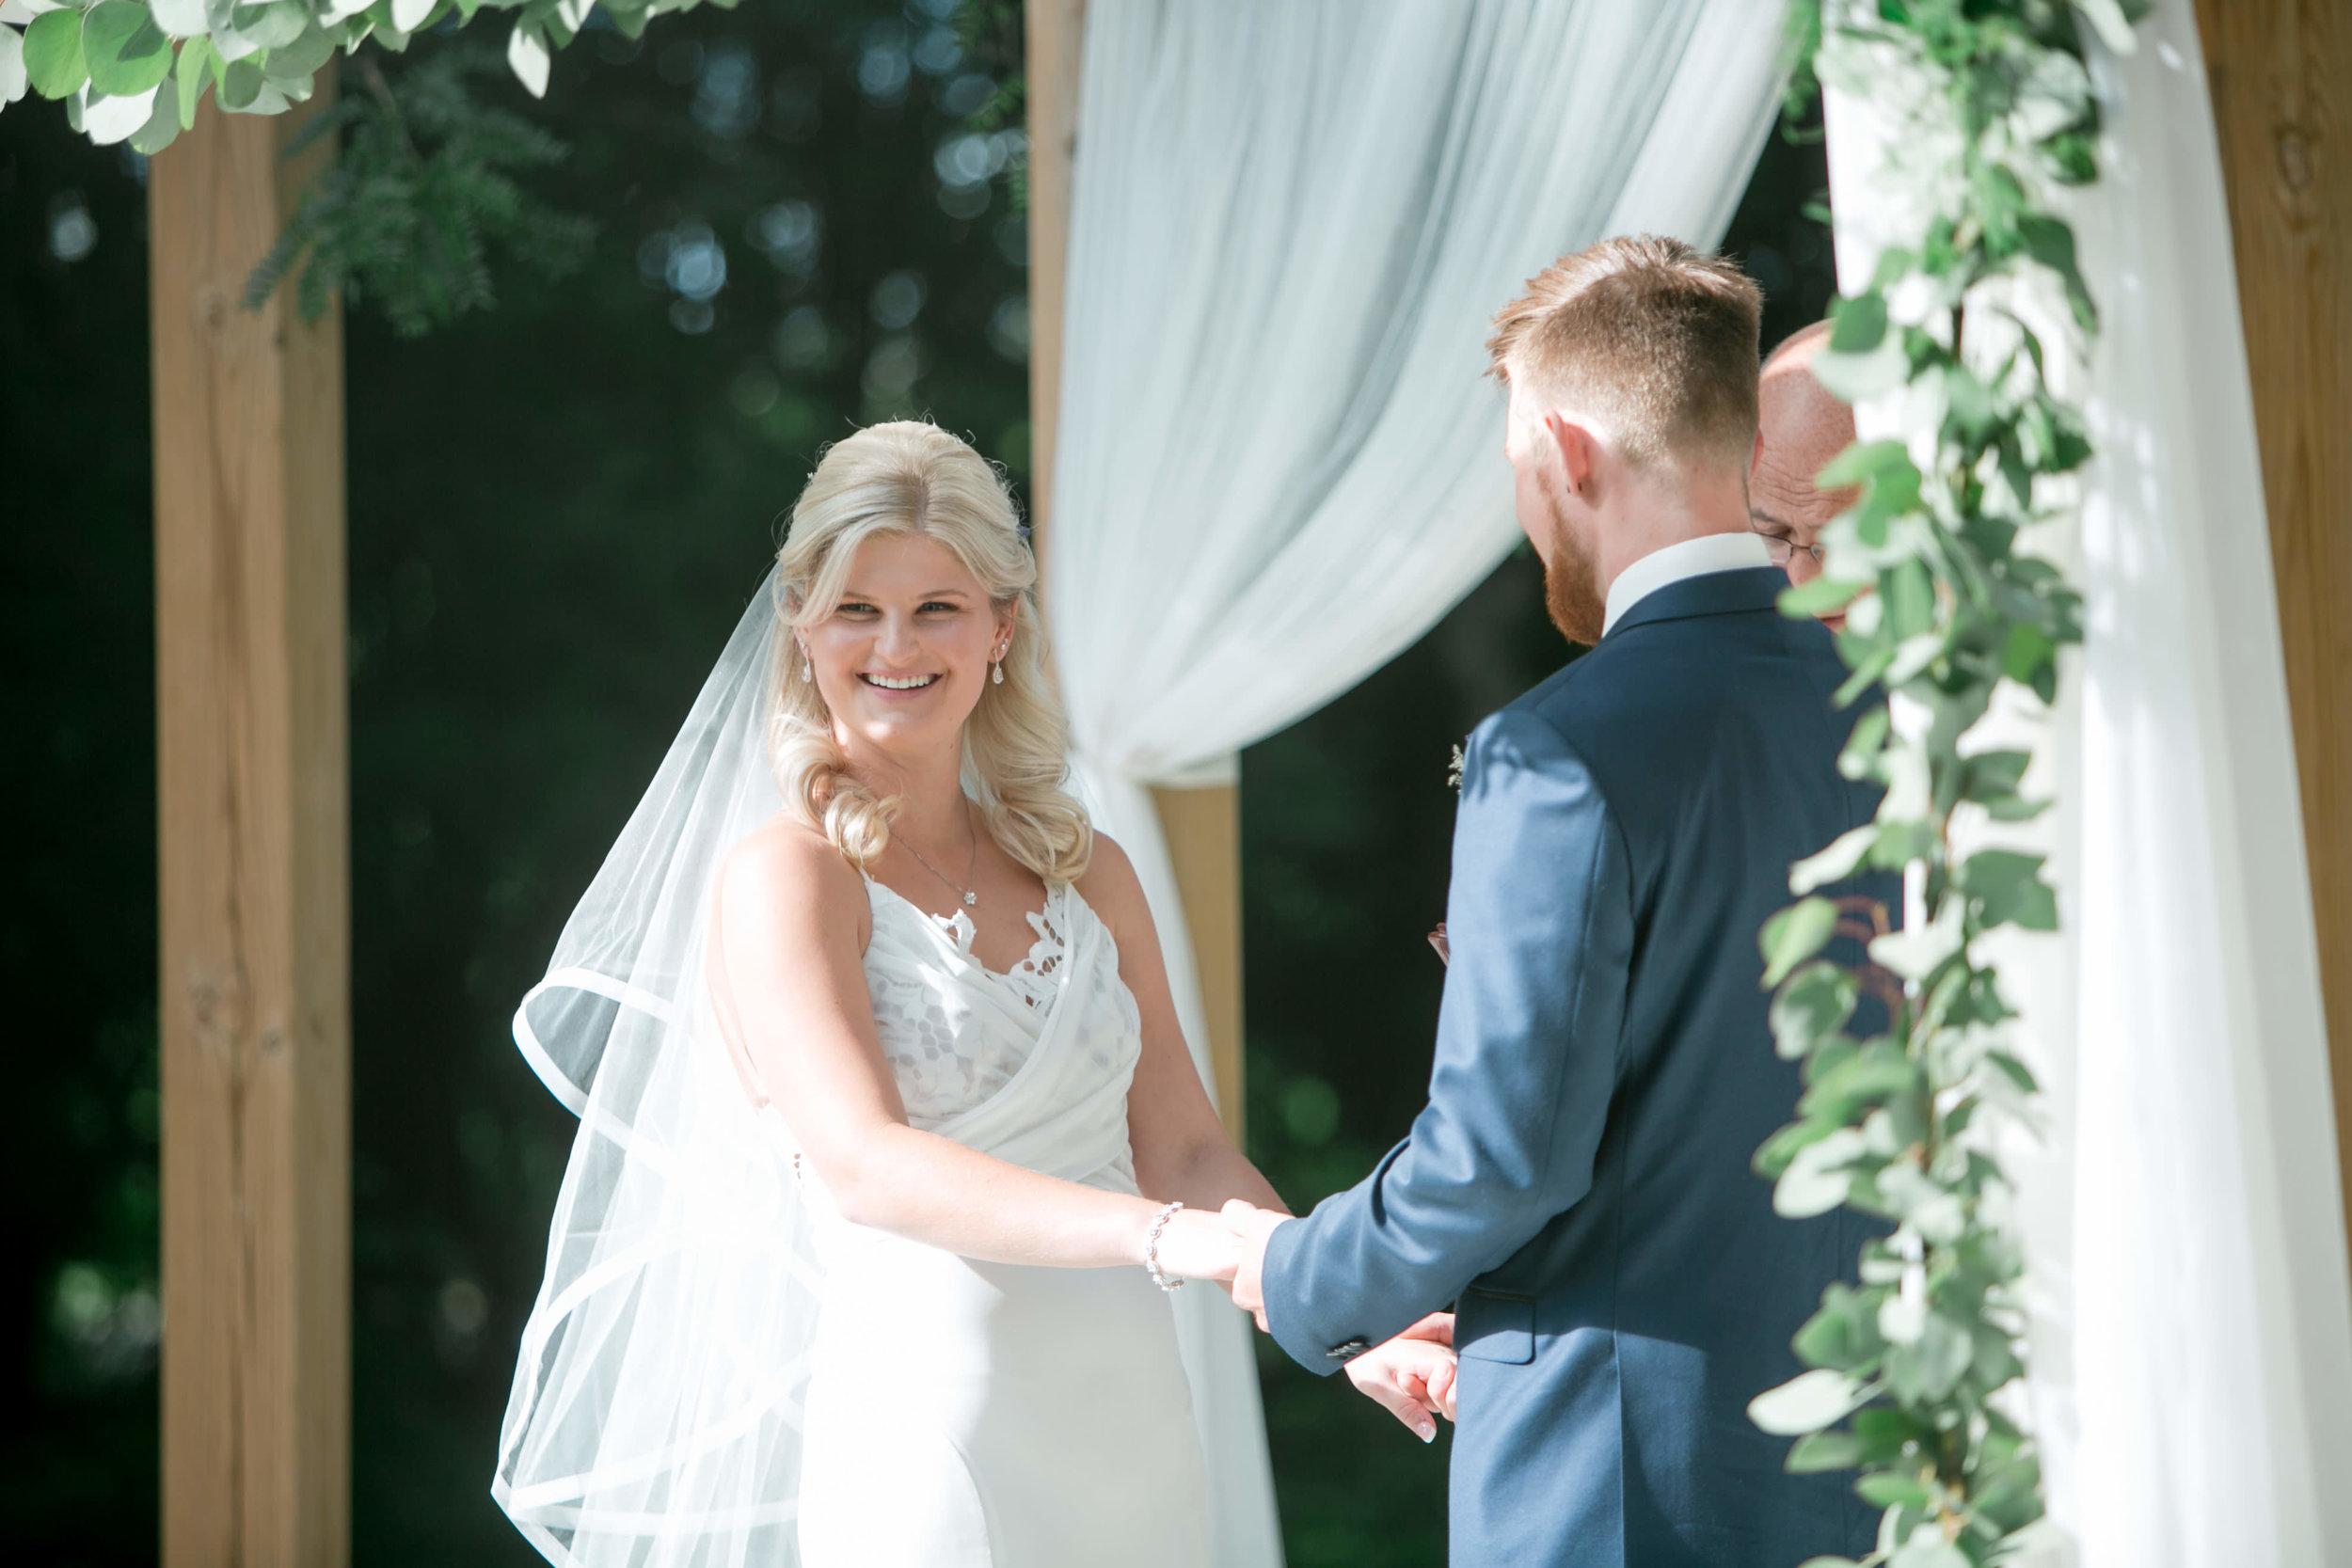 Maddy___Brandon___Daniel_Ricci_Weddings_High_Res._Finals_276.jpg